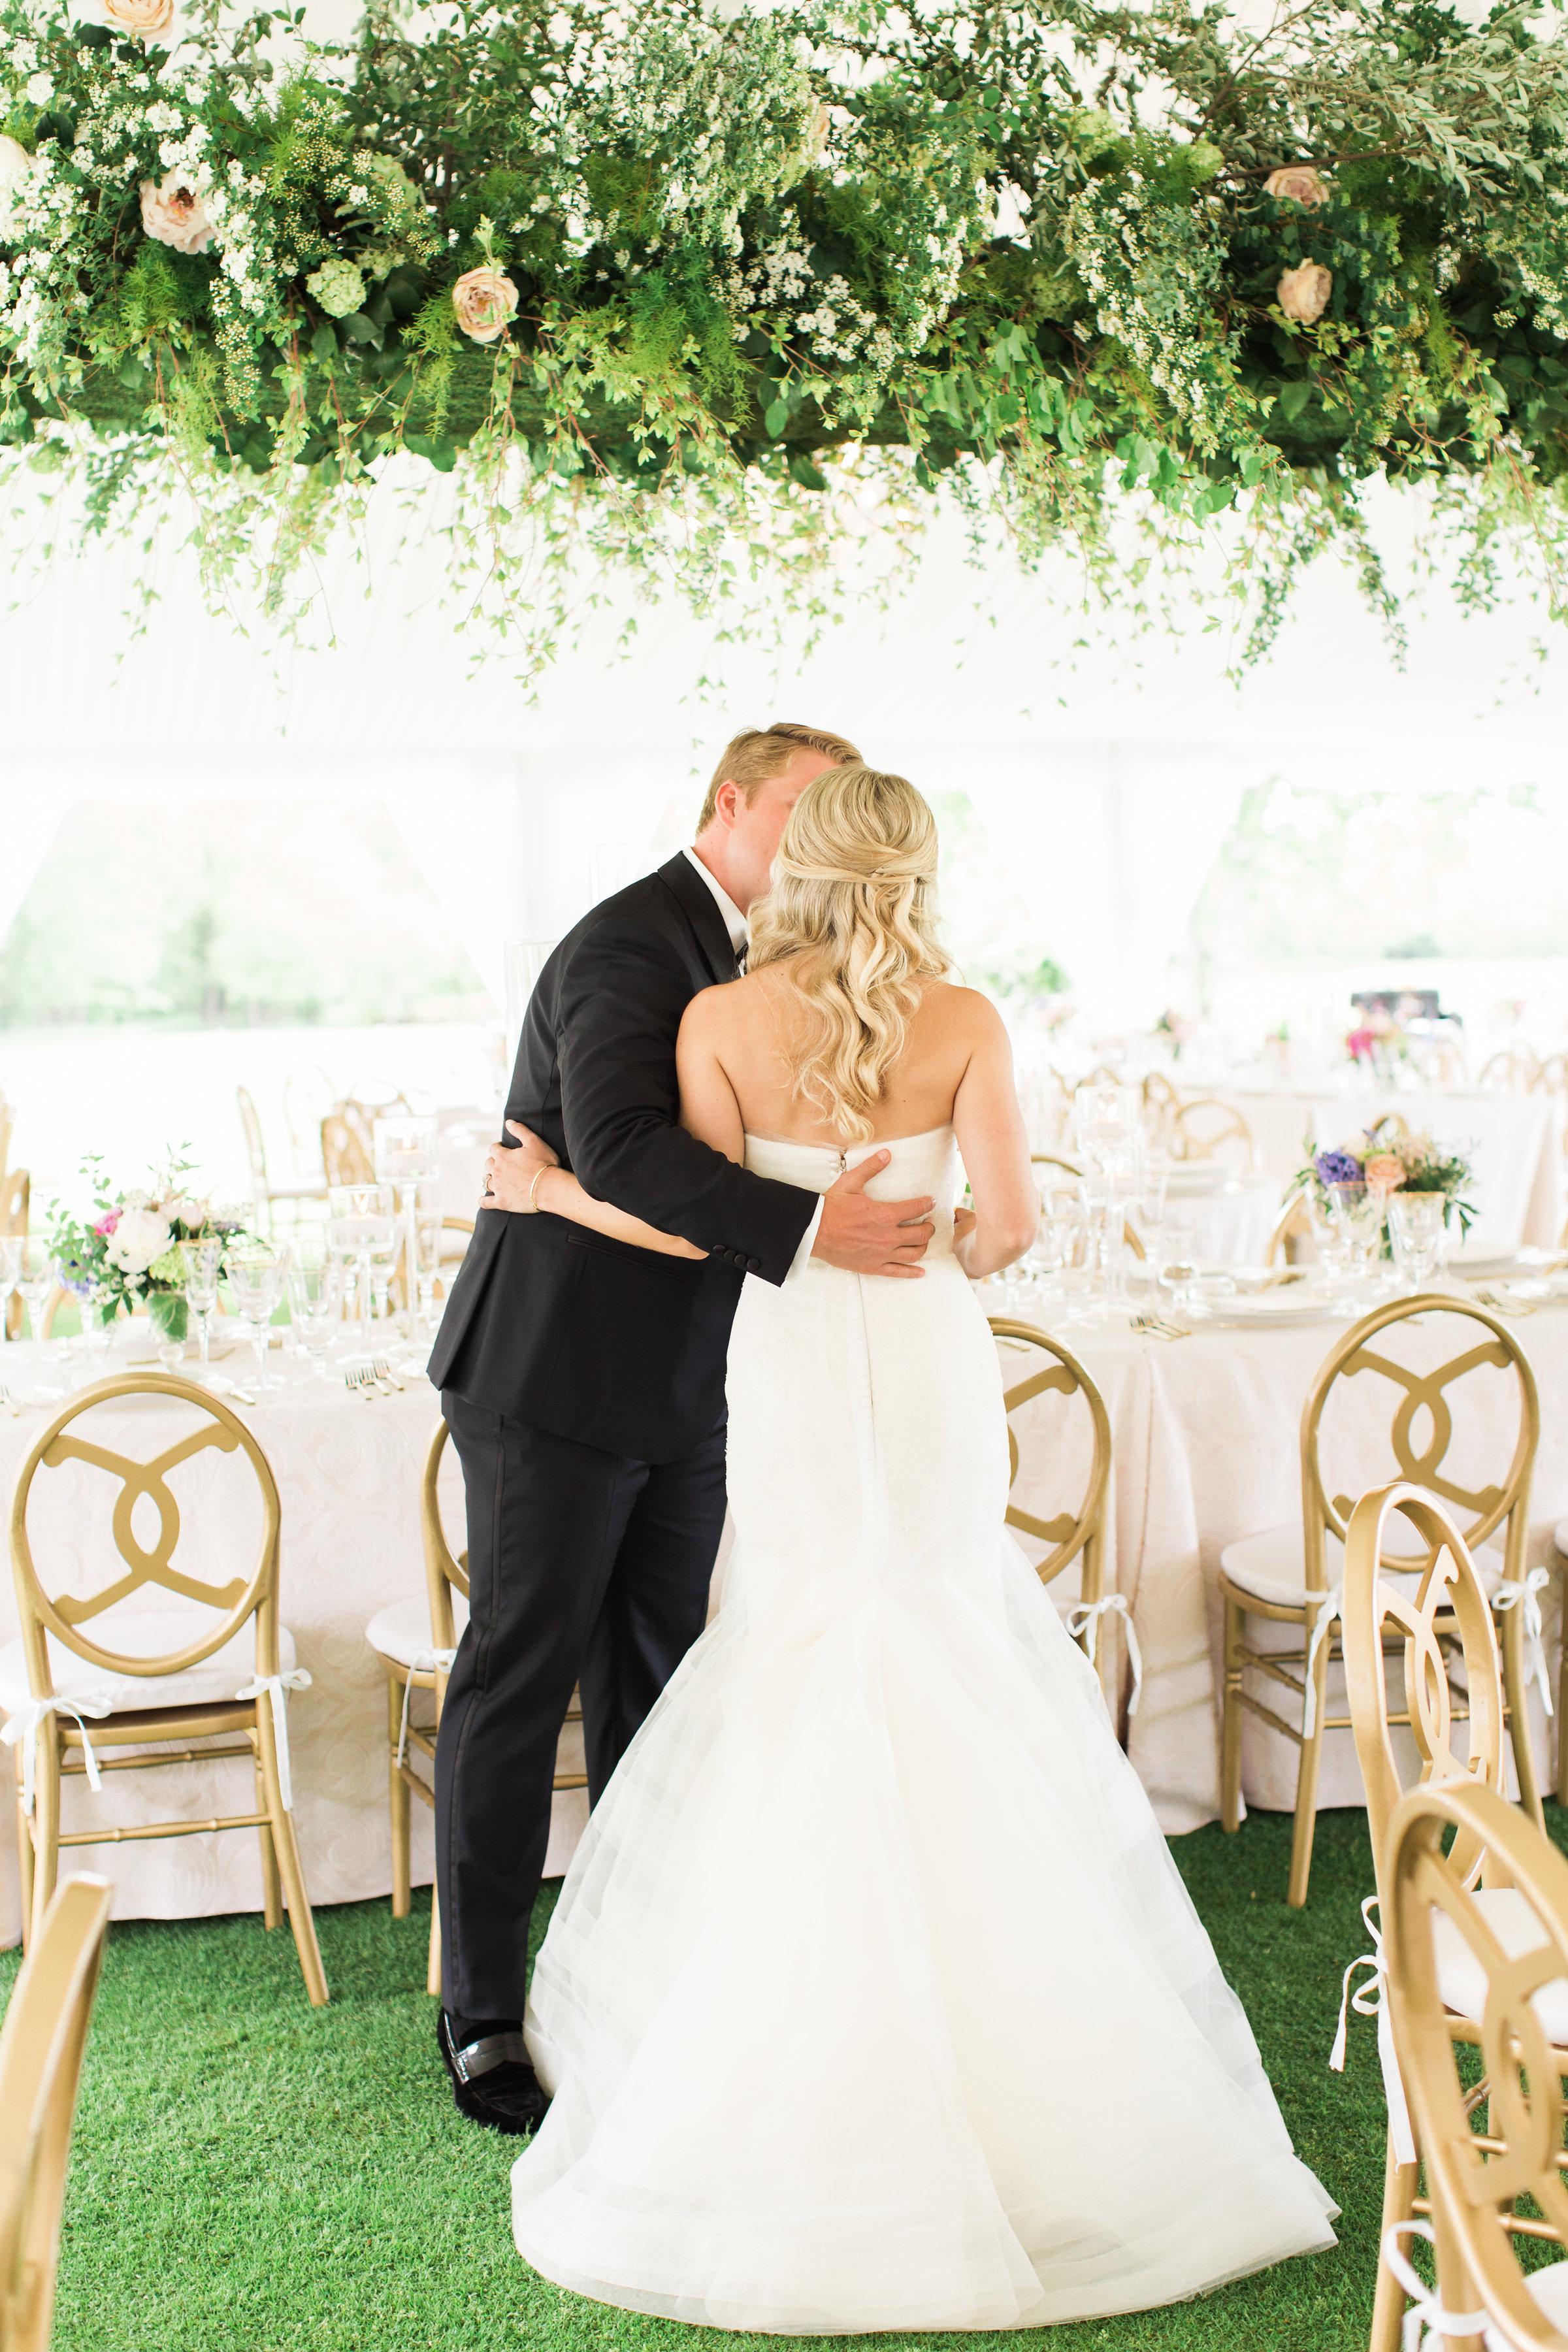 Coffman+Wedding+Cocktail+Hour-5.jpg